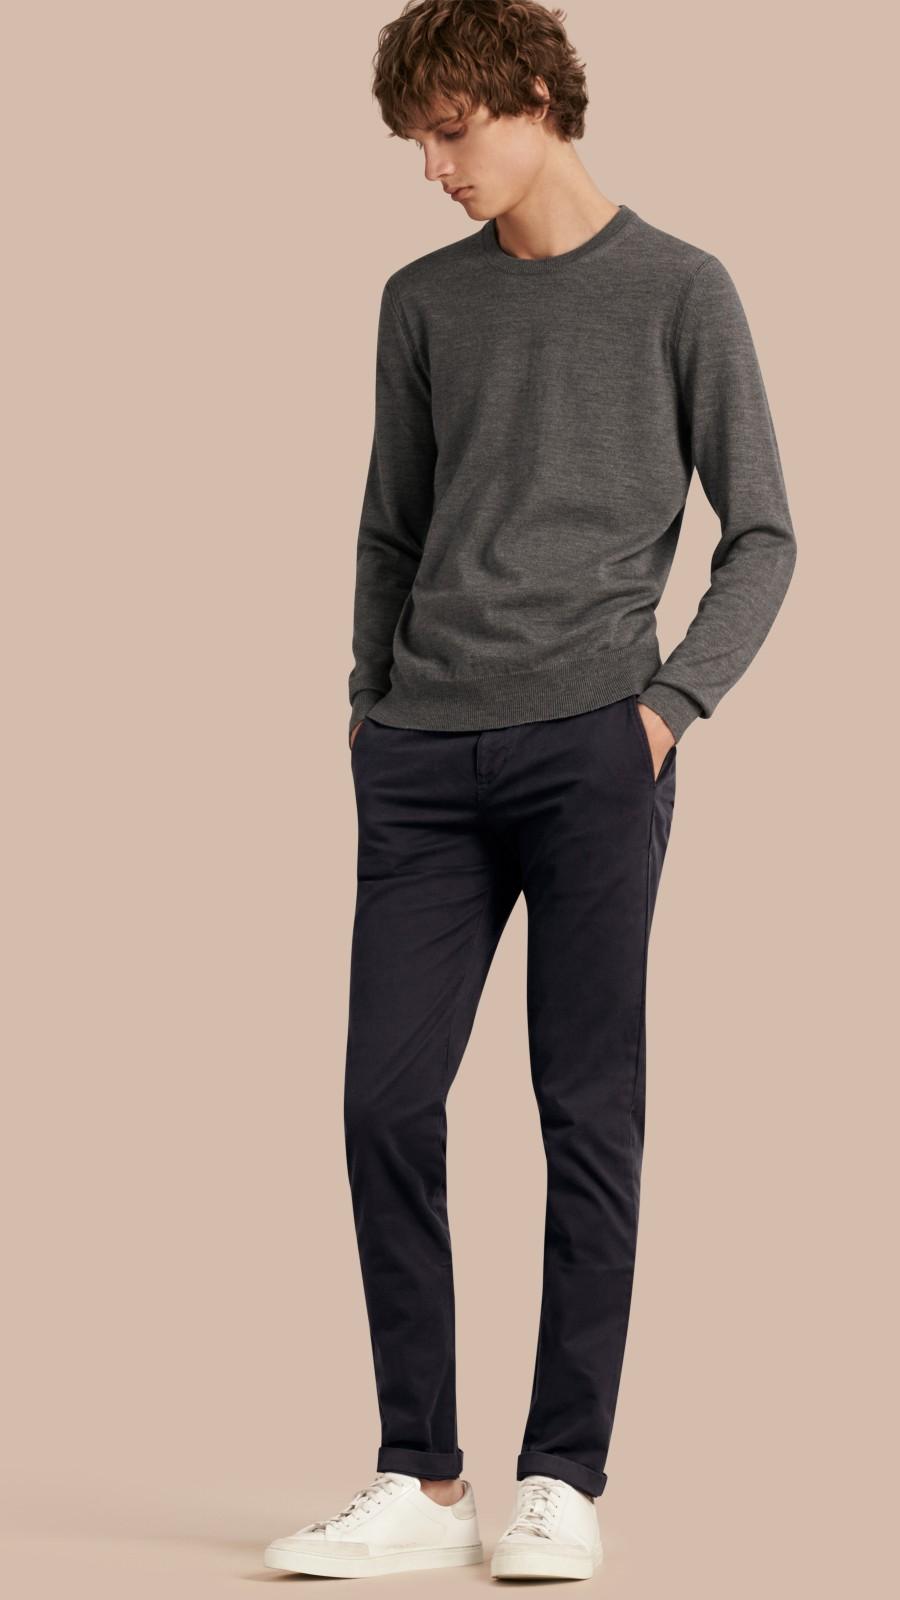 Navy Slim Fit Stretch-Cotton Twill Chinos Navy - Image 1